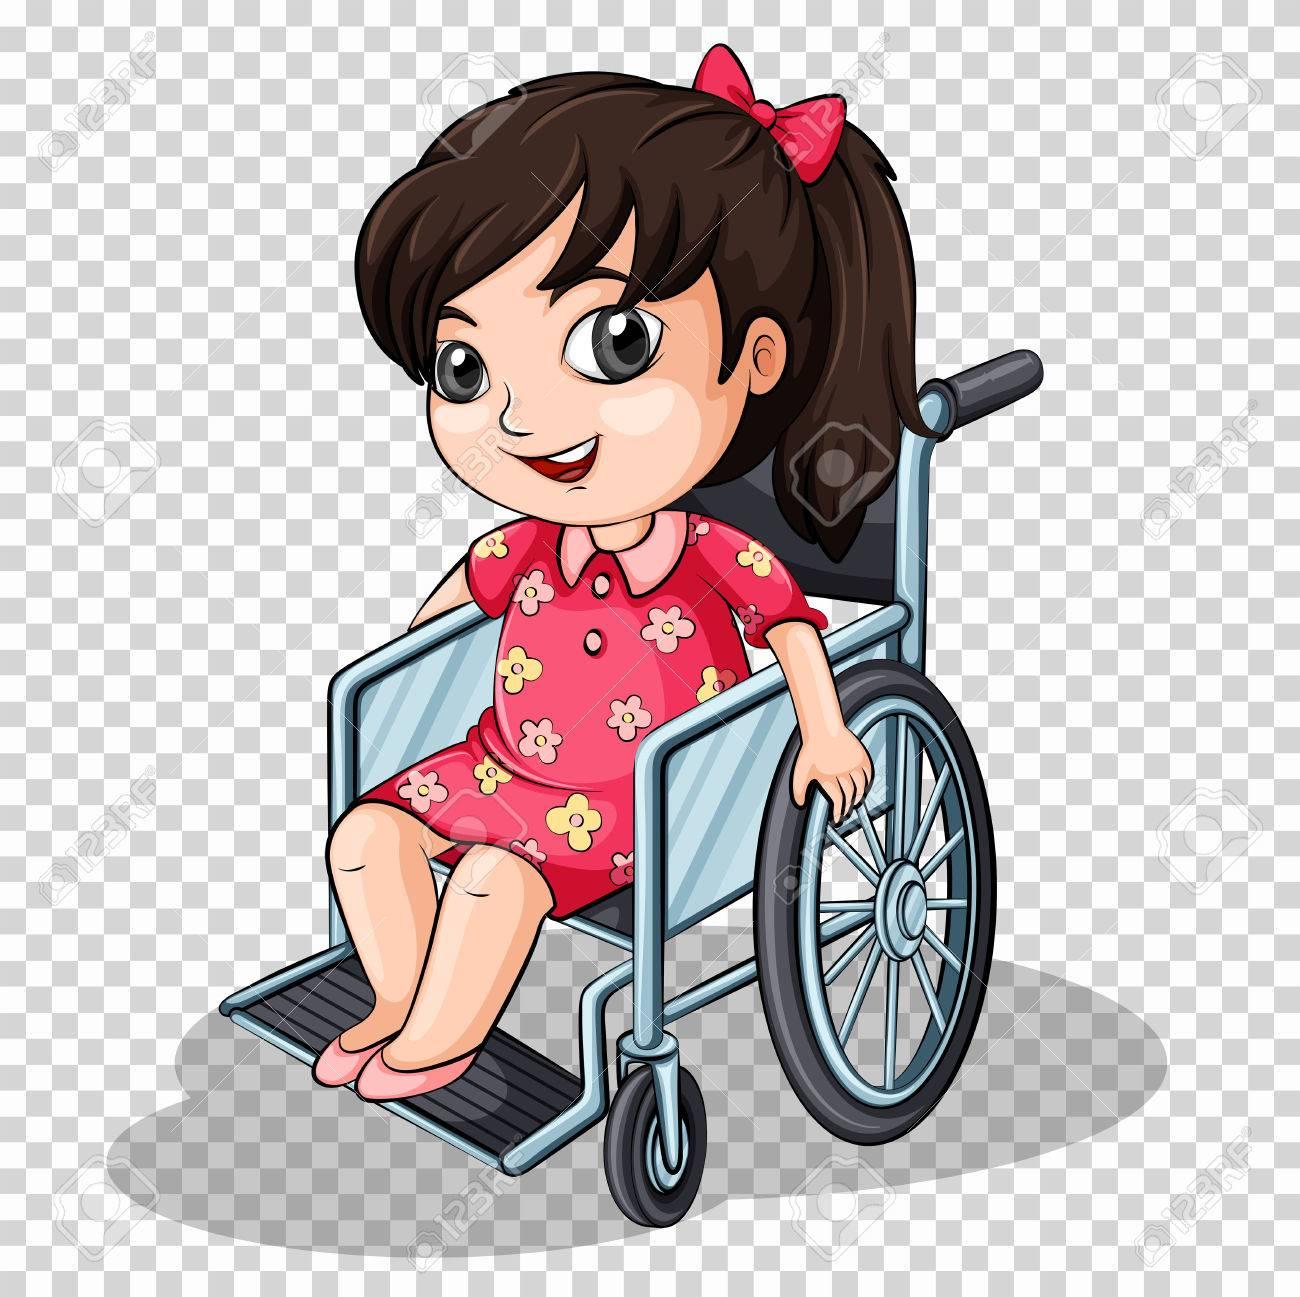 Girl on wheelchair on transparent background illustration - 78000018